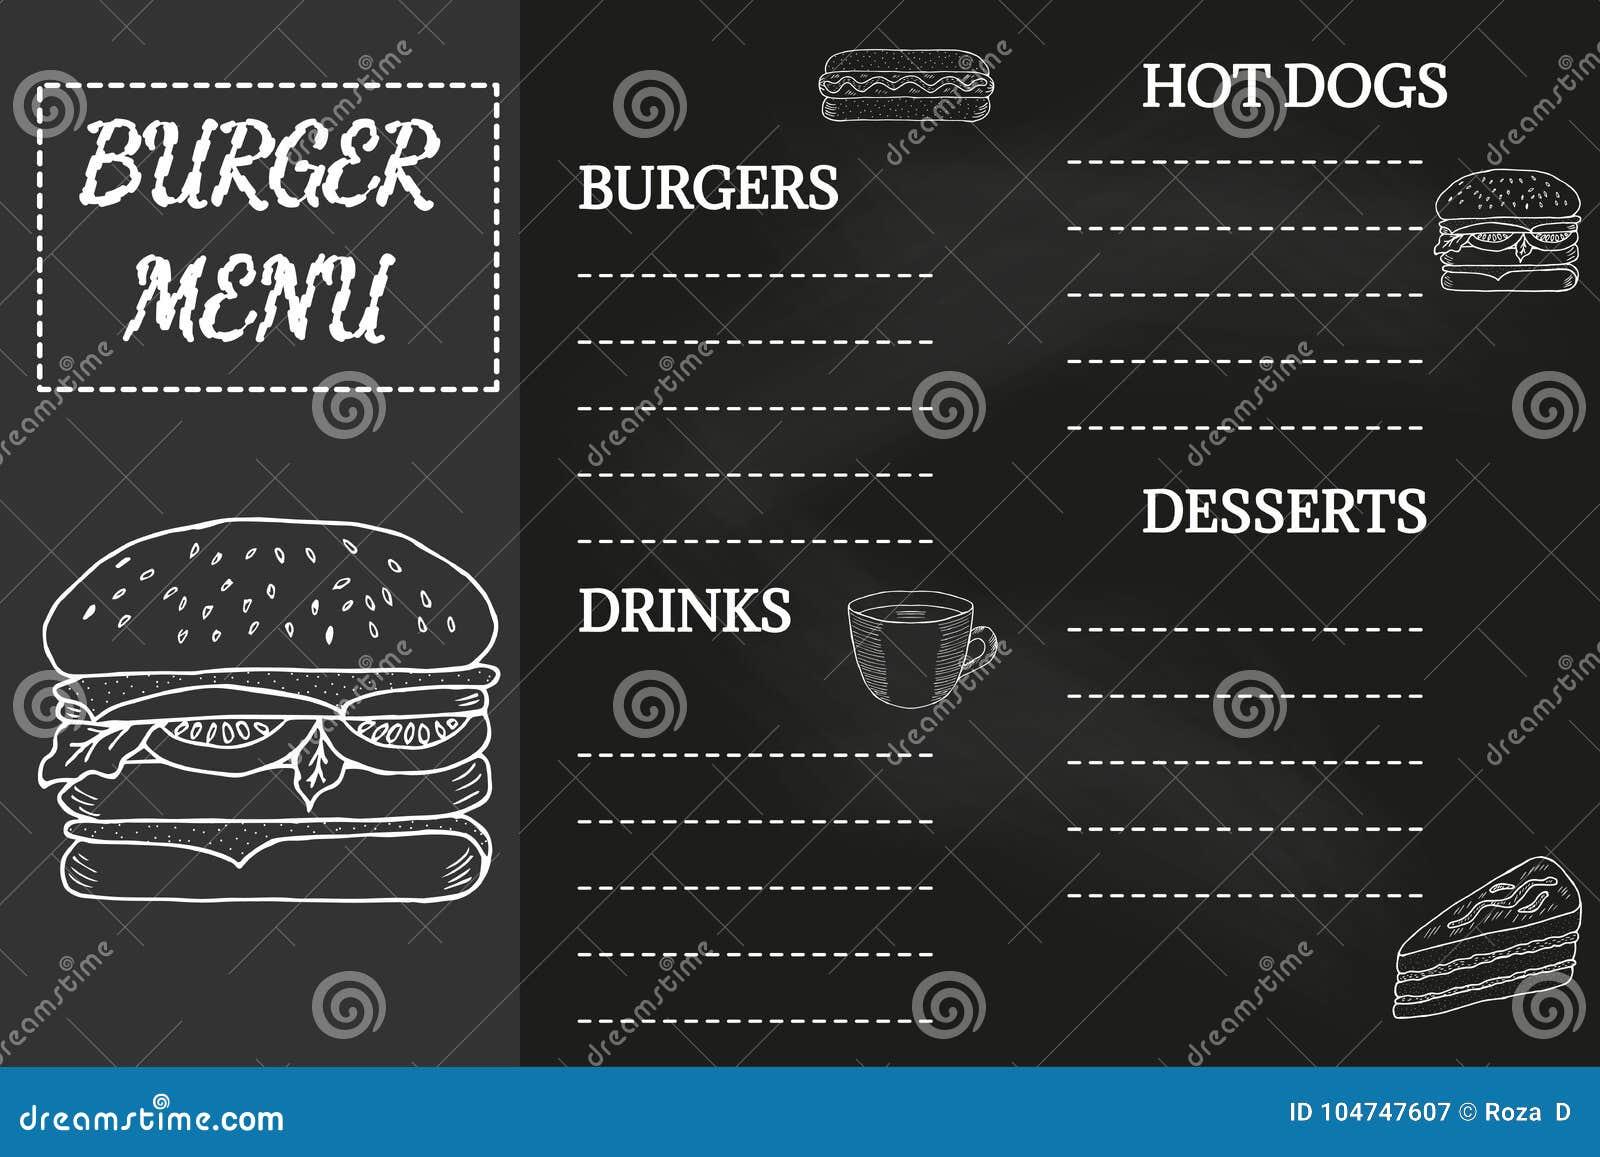 burger menu chalkboard stock vector illustration of card 104747607